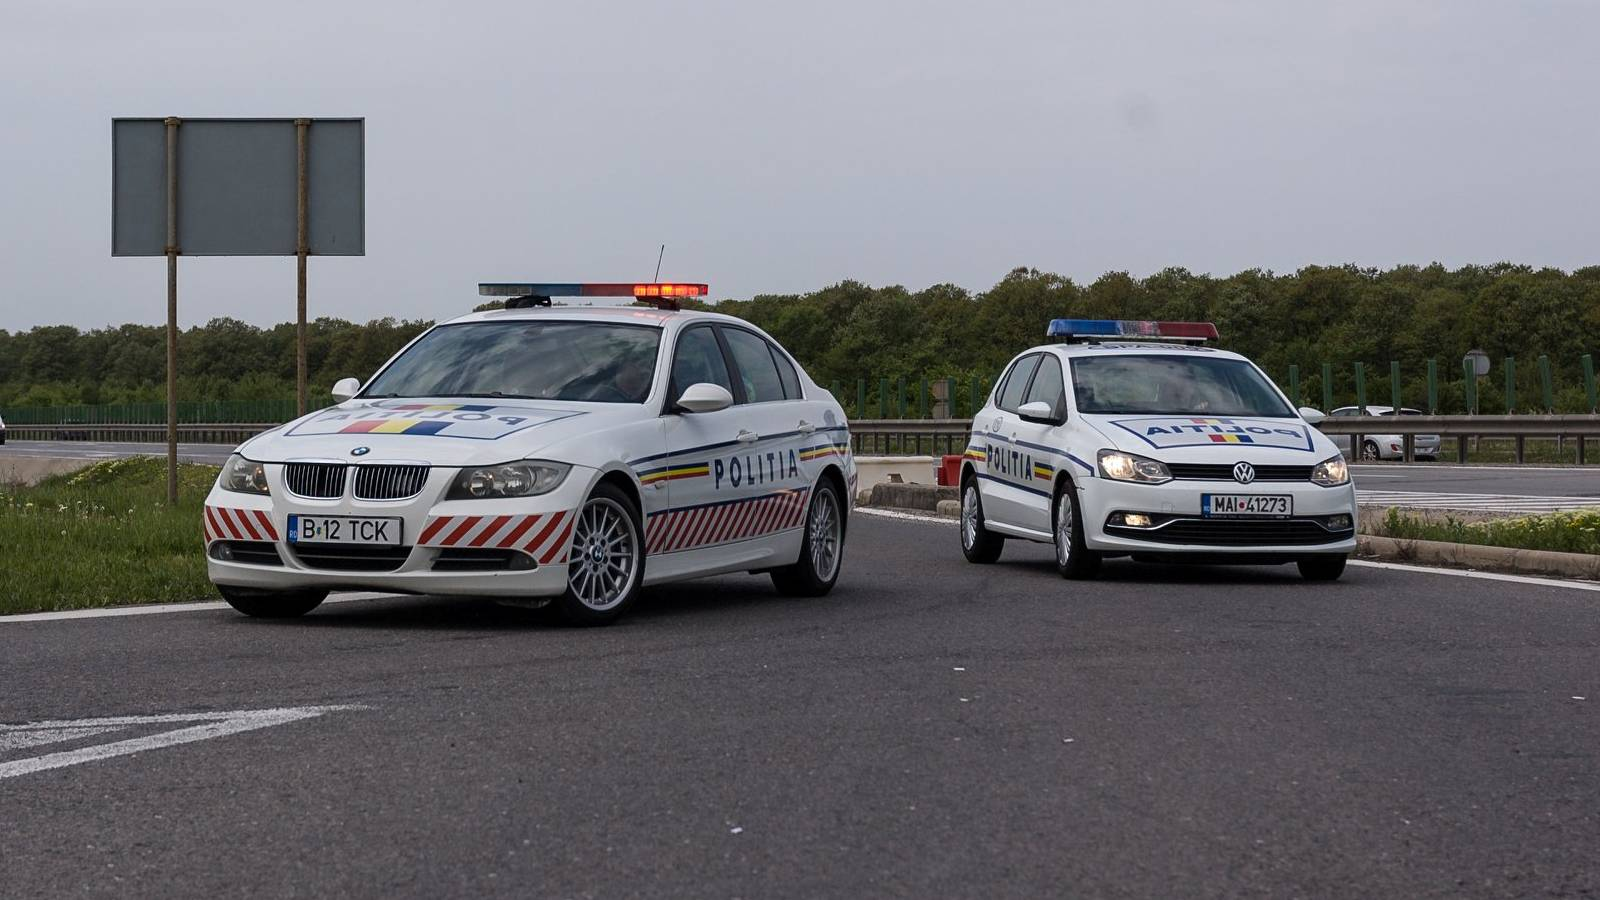 Noua Atentionare Politiei Romane Viteza Autostrada